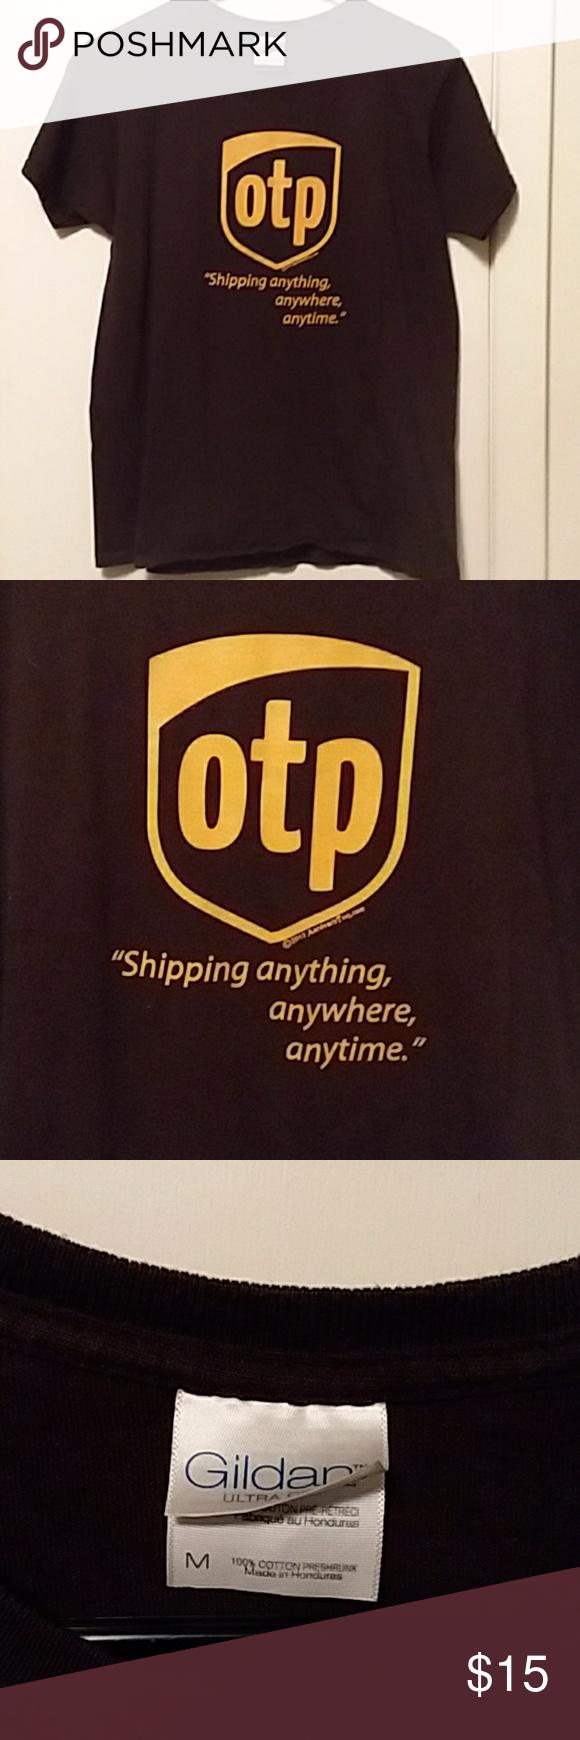 OTP, UPS Inspired Shirt One True Pairing shirt stylized like